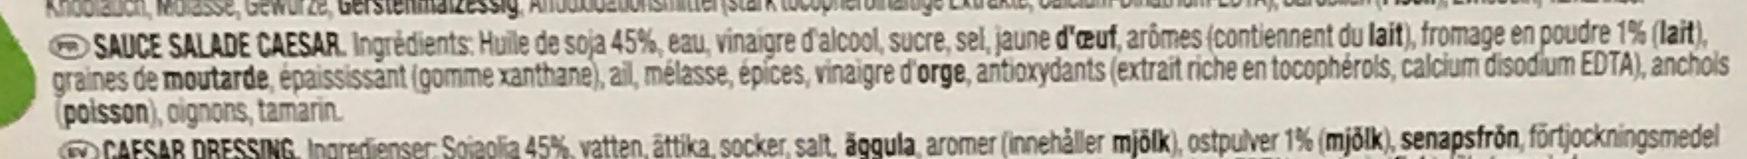 Salad Dressing Caesar - Ingrédients